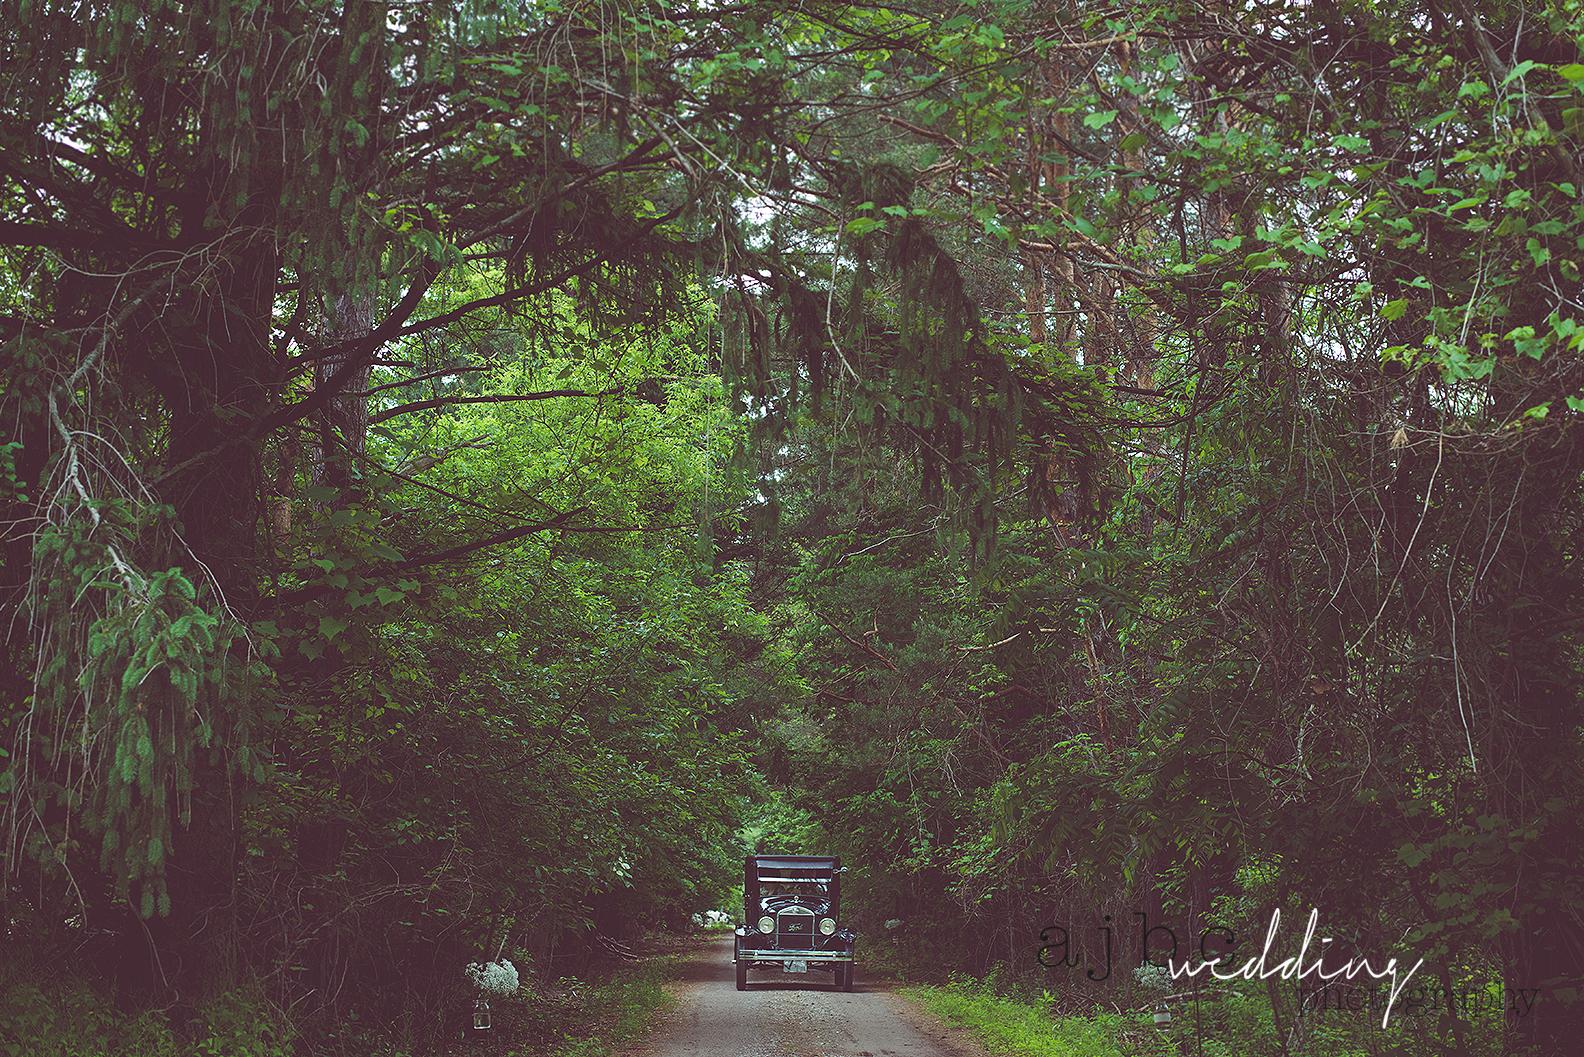 ajbcphotography-port-huron-michigan-wedding-photographer-outdoors-summer-wedding-country-wedding-wadhams-michigan-bride-vintage-wedding8.jpg